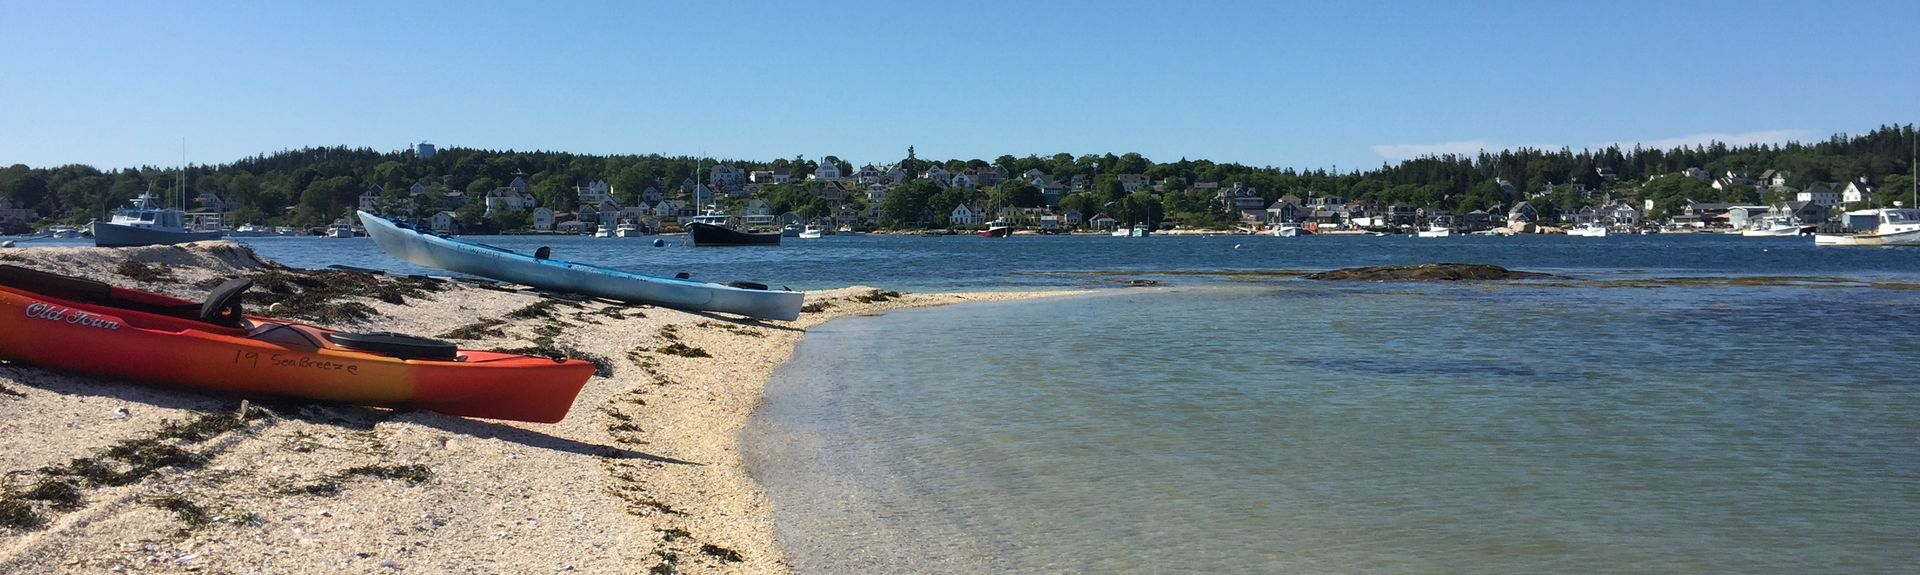 Isle Au Haut, Maine, United States of America